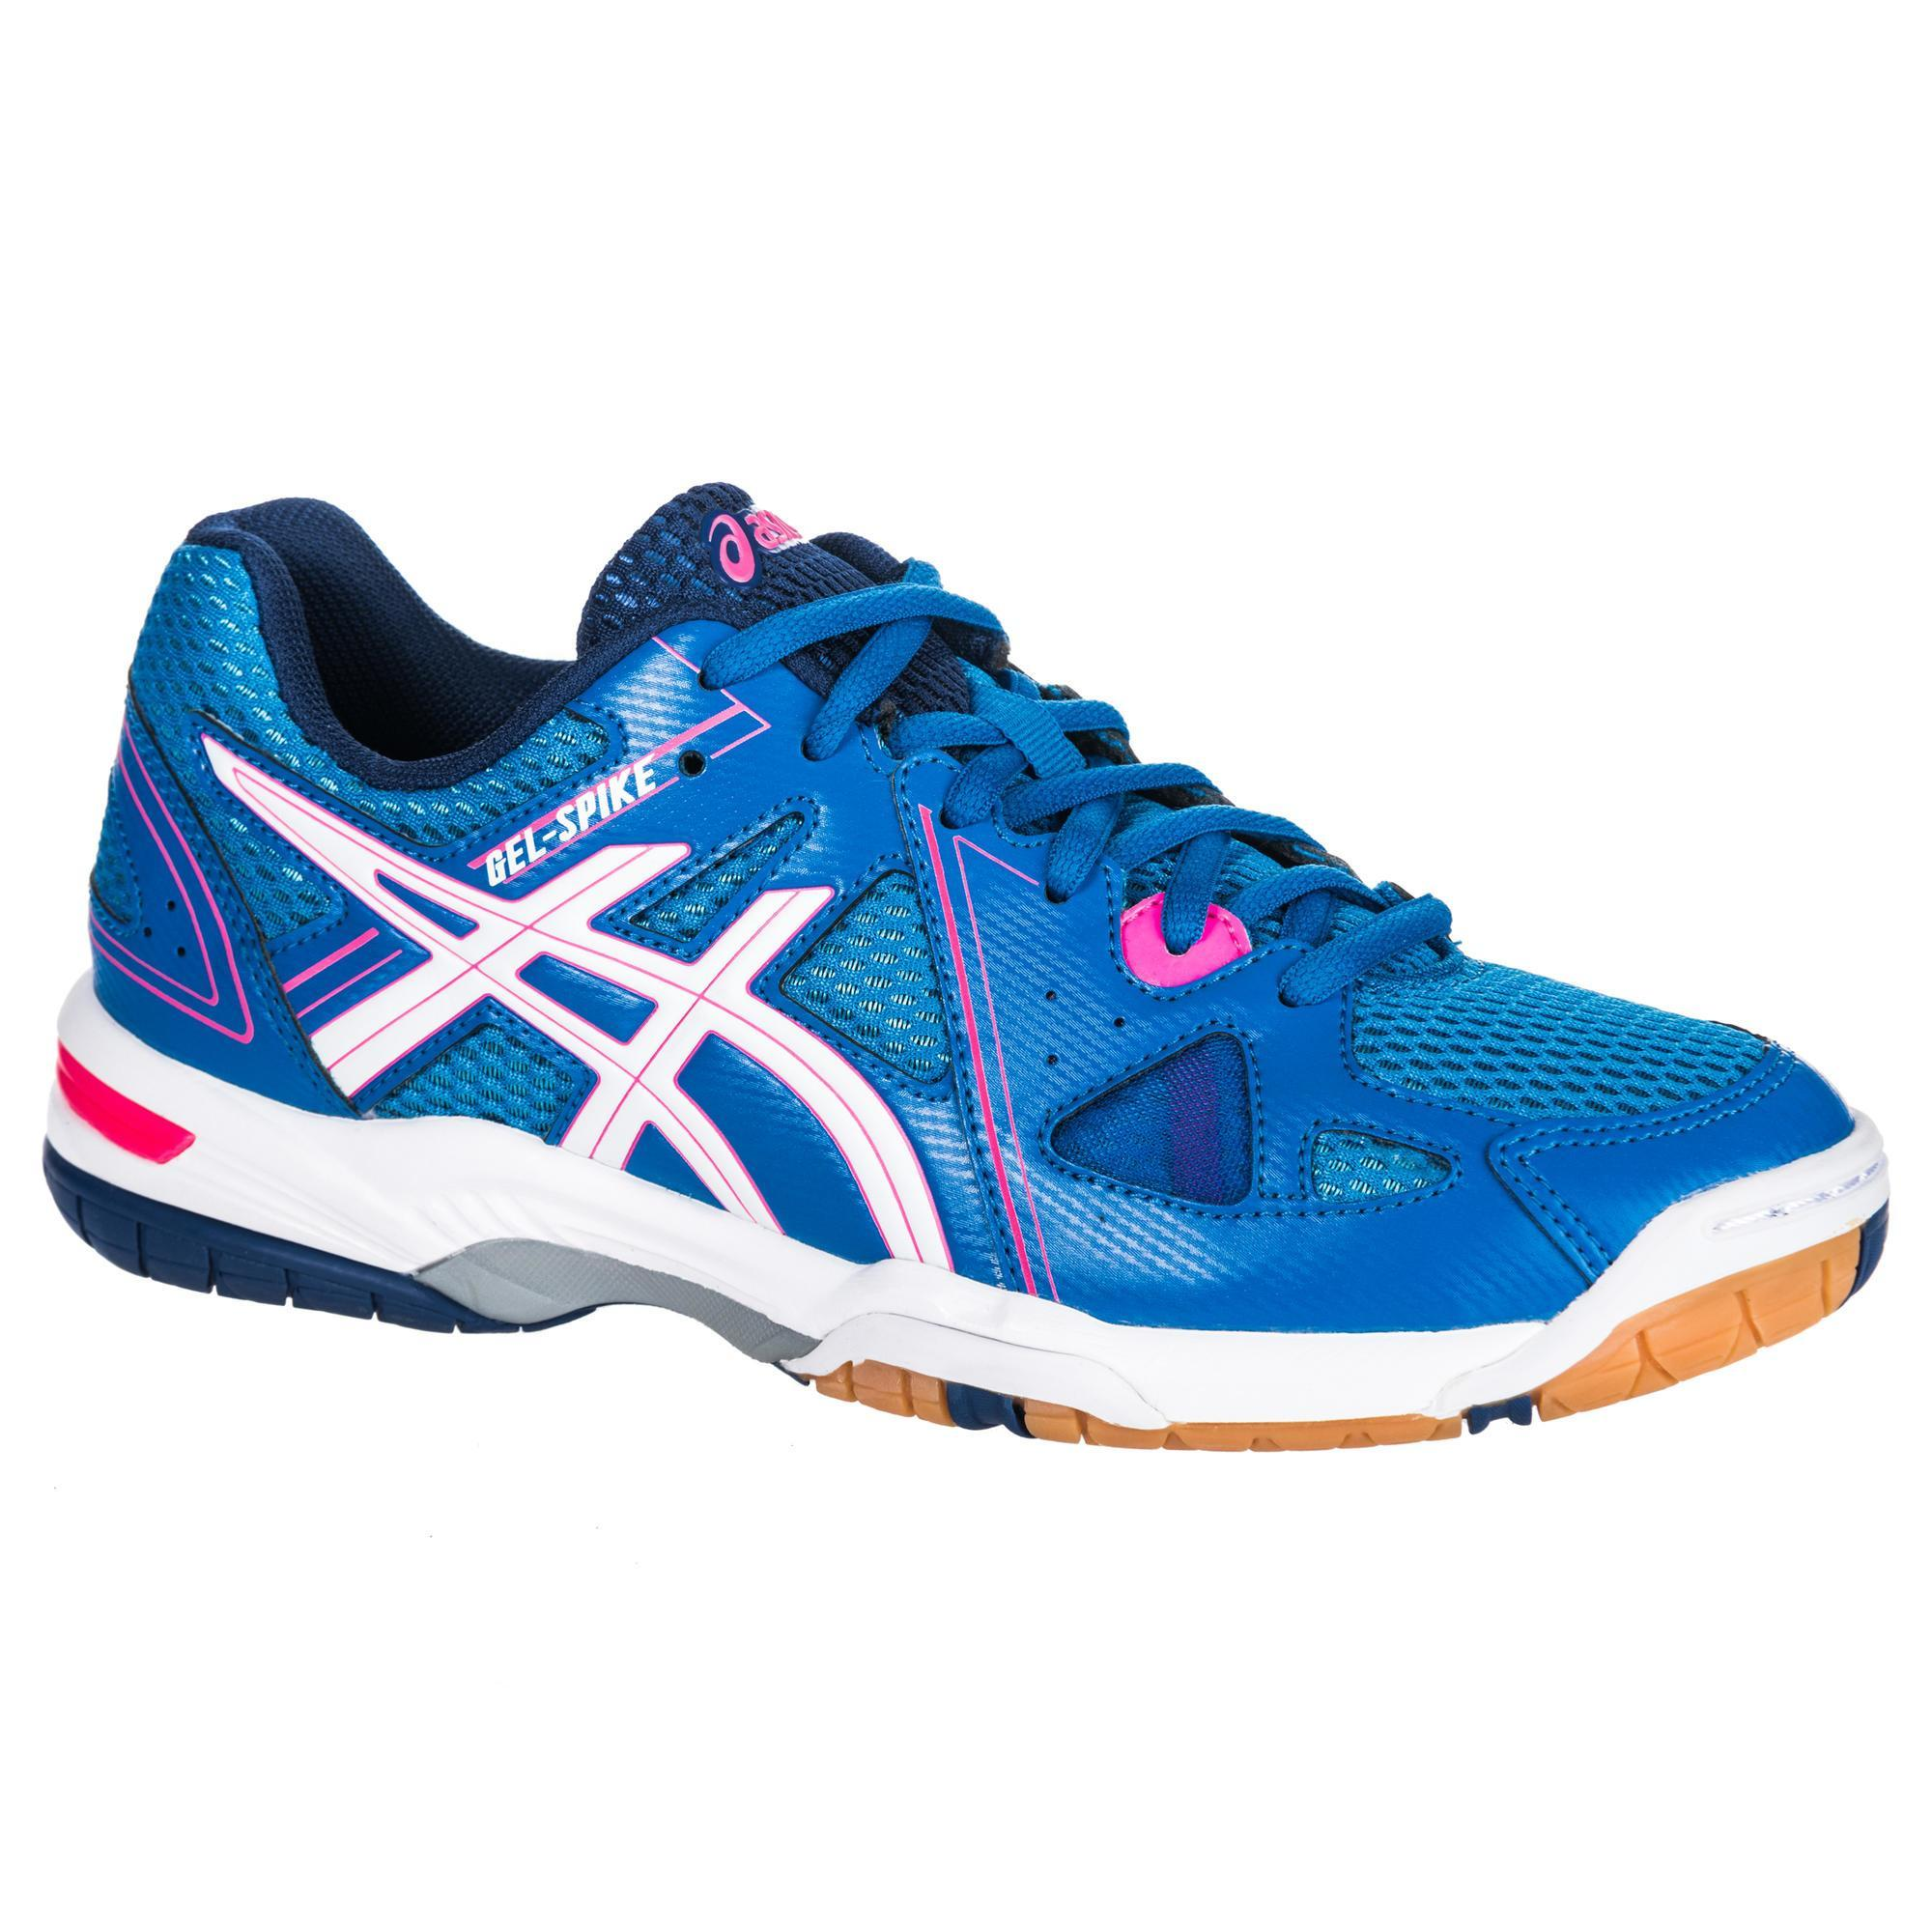 Asics Volleybalschoenen dames Gel Spike blauw/roze